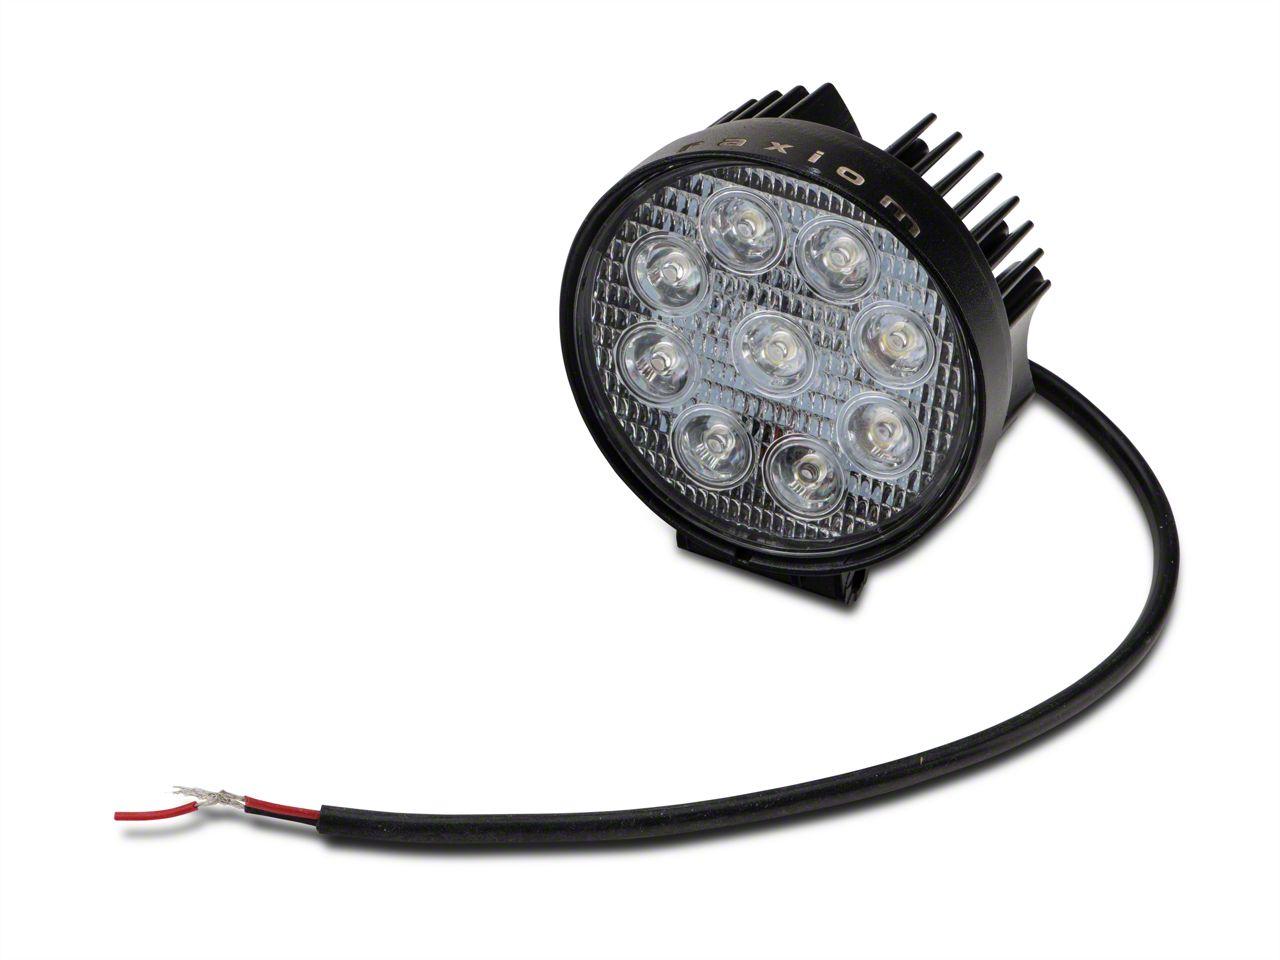 Raxiom 4.5 in. Round 9 LED Light - Flood Beam